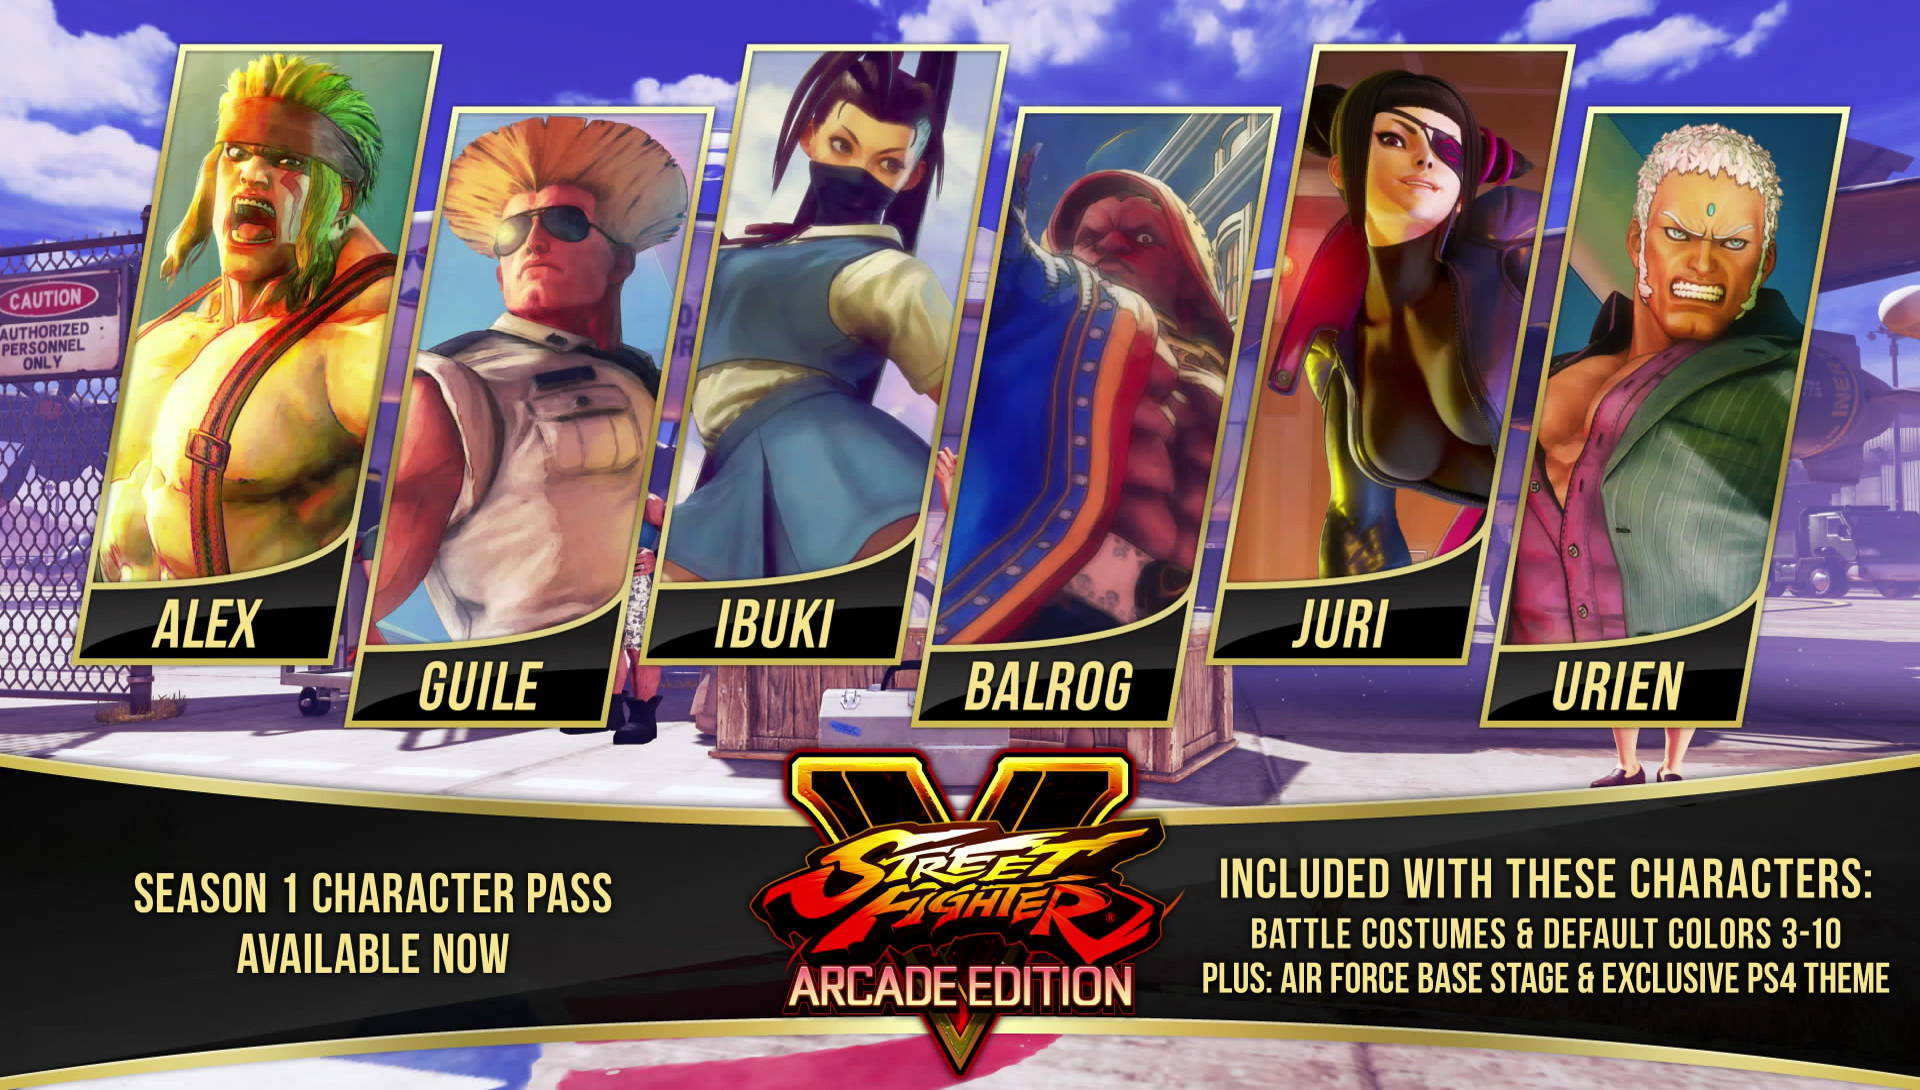 Street Fighter V Season 1 Character Pass Steam Title